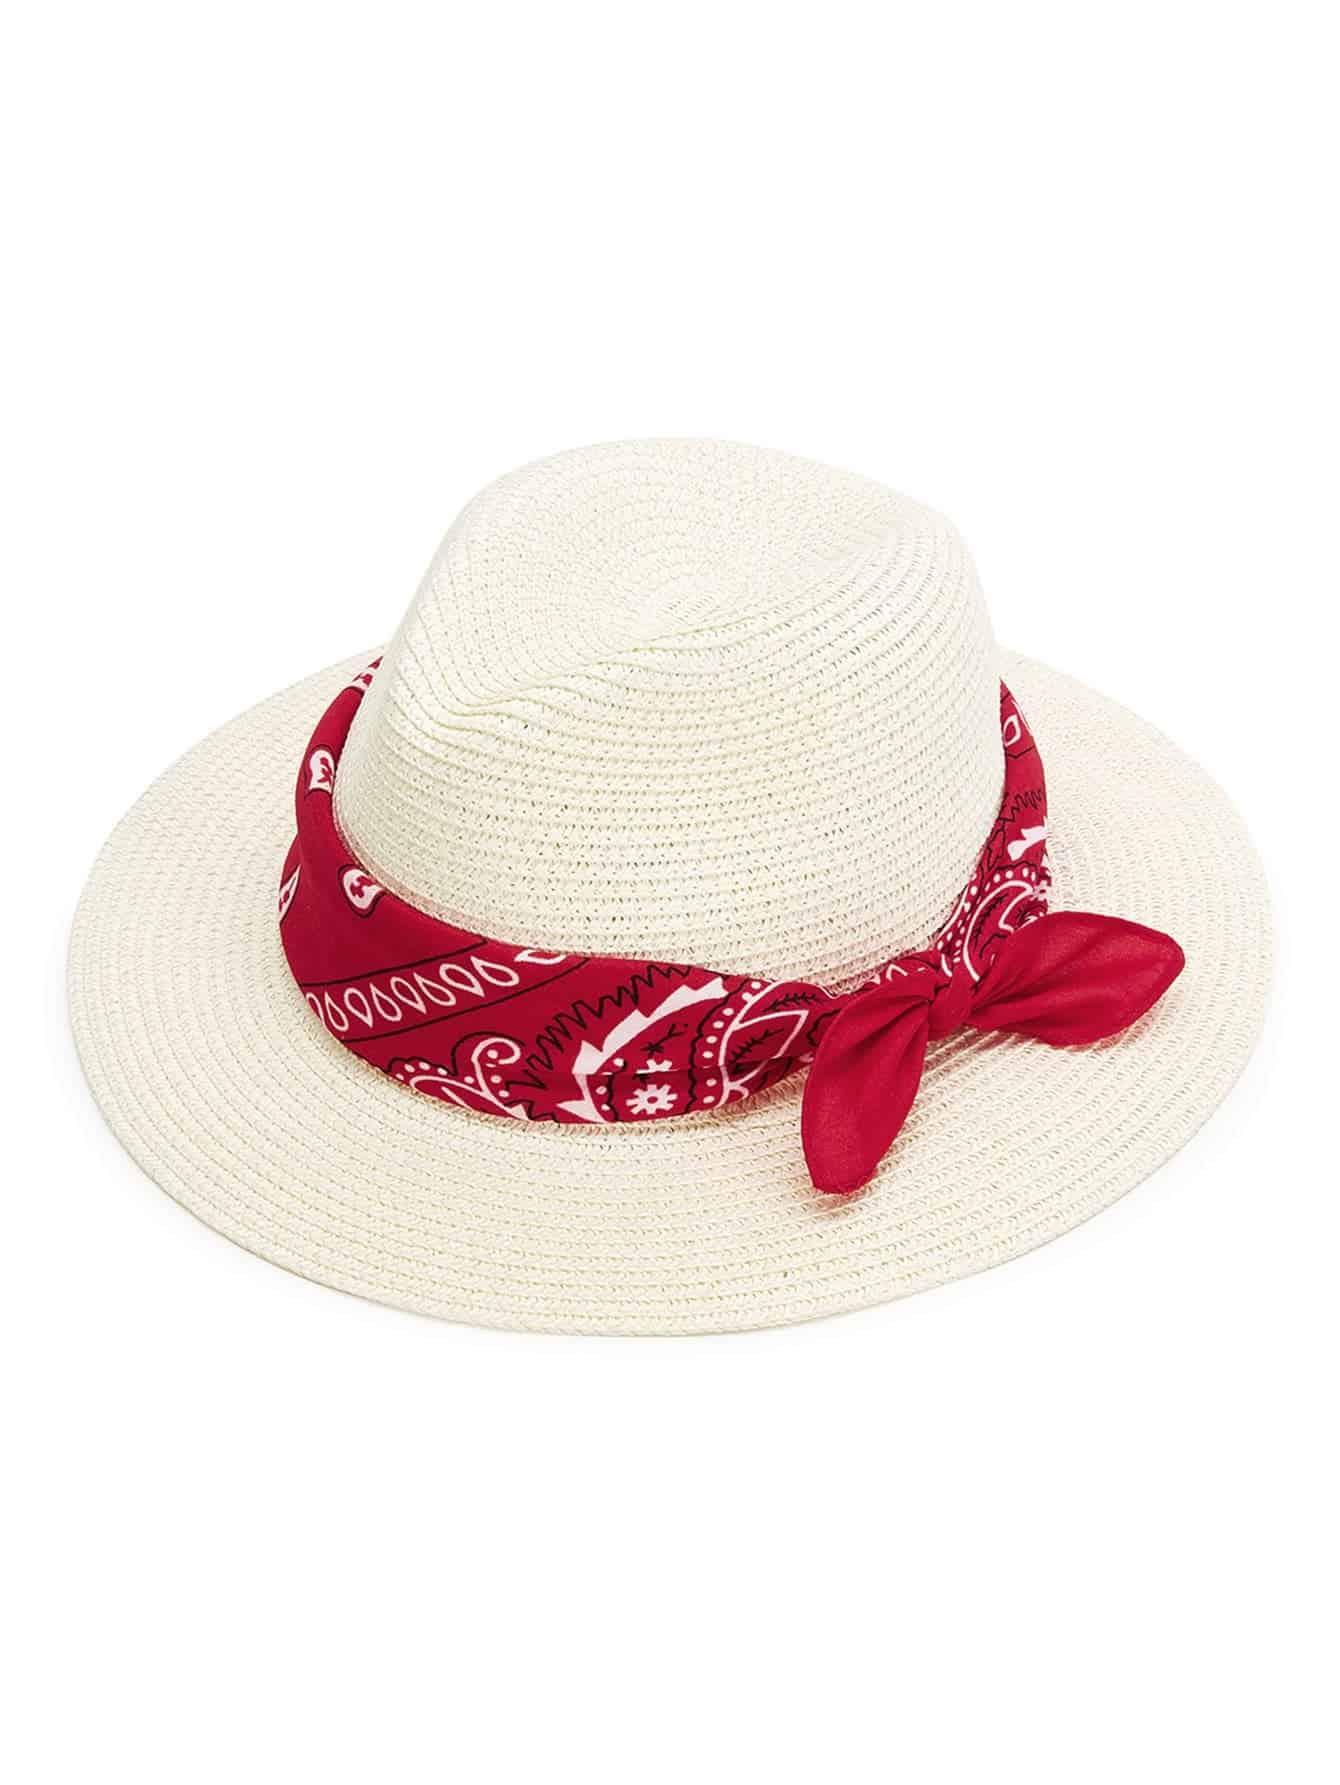 Straw Fedora Hat With Scarf